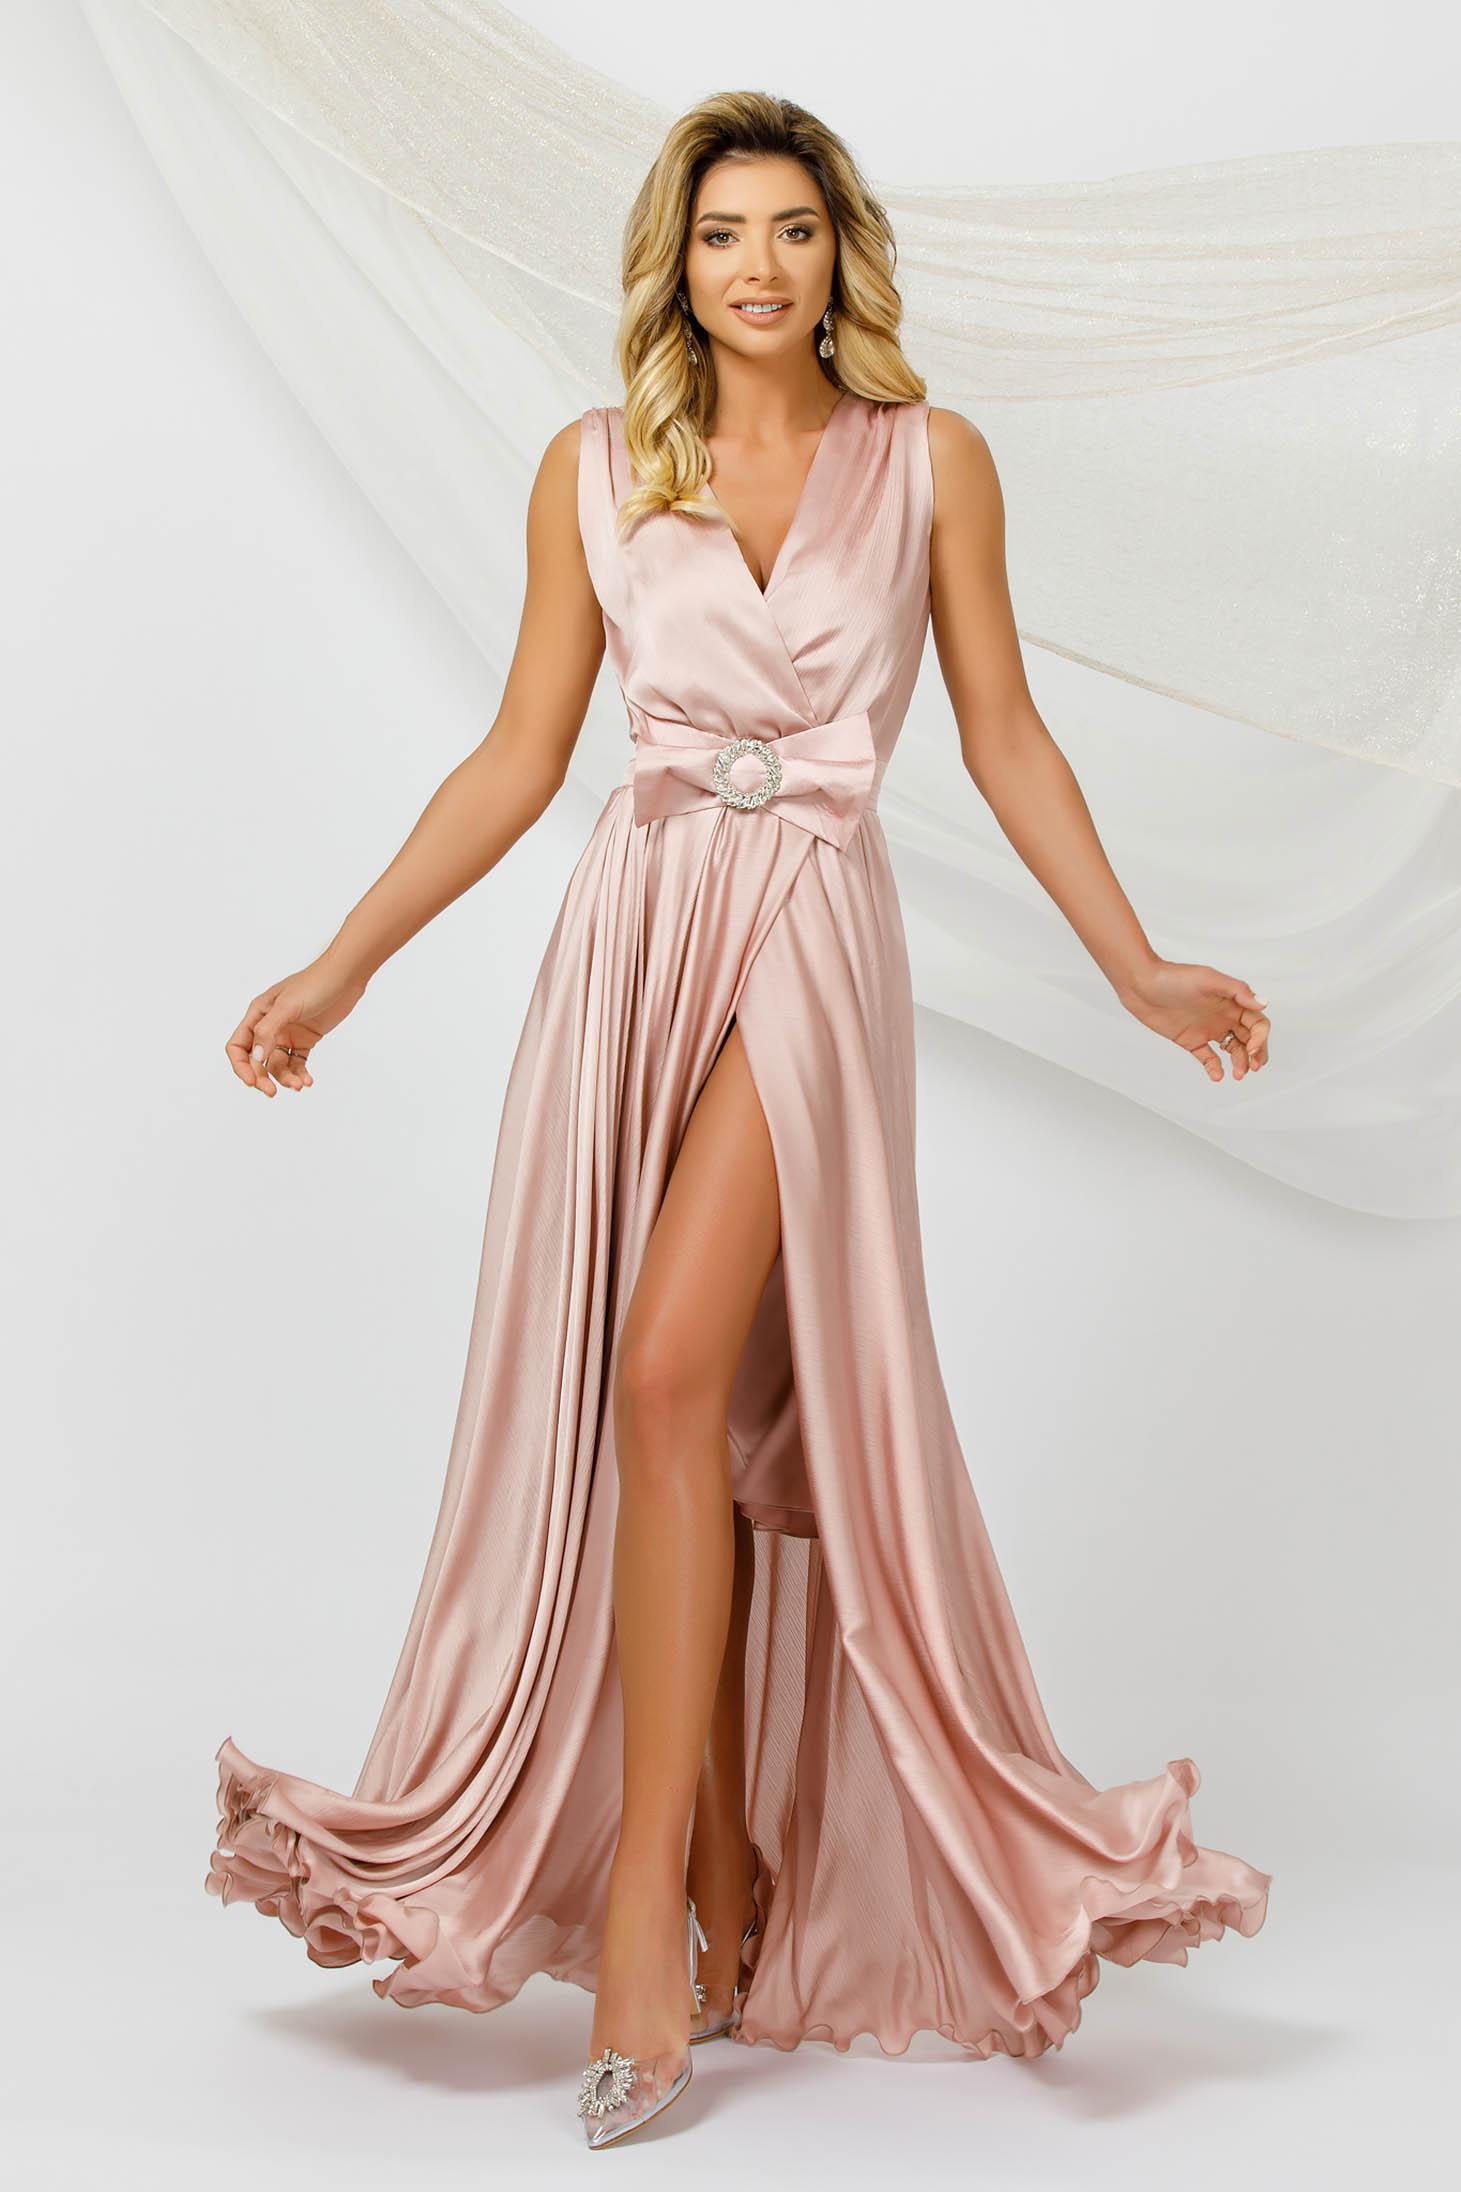 Rochie PrettyGirl roz prafuit lunga de ocazie in clos din voal din material satinat fara maneci